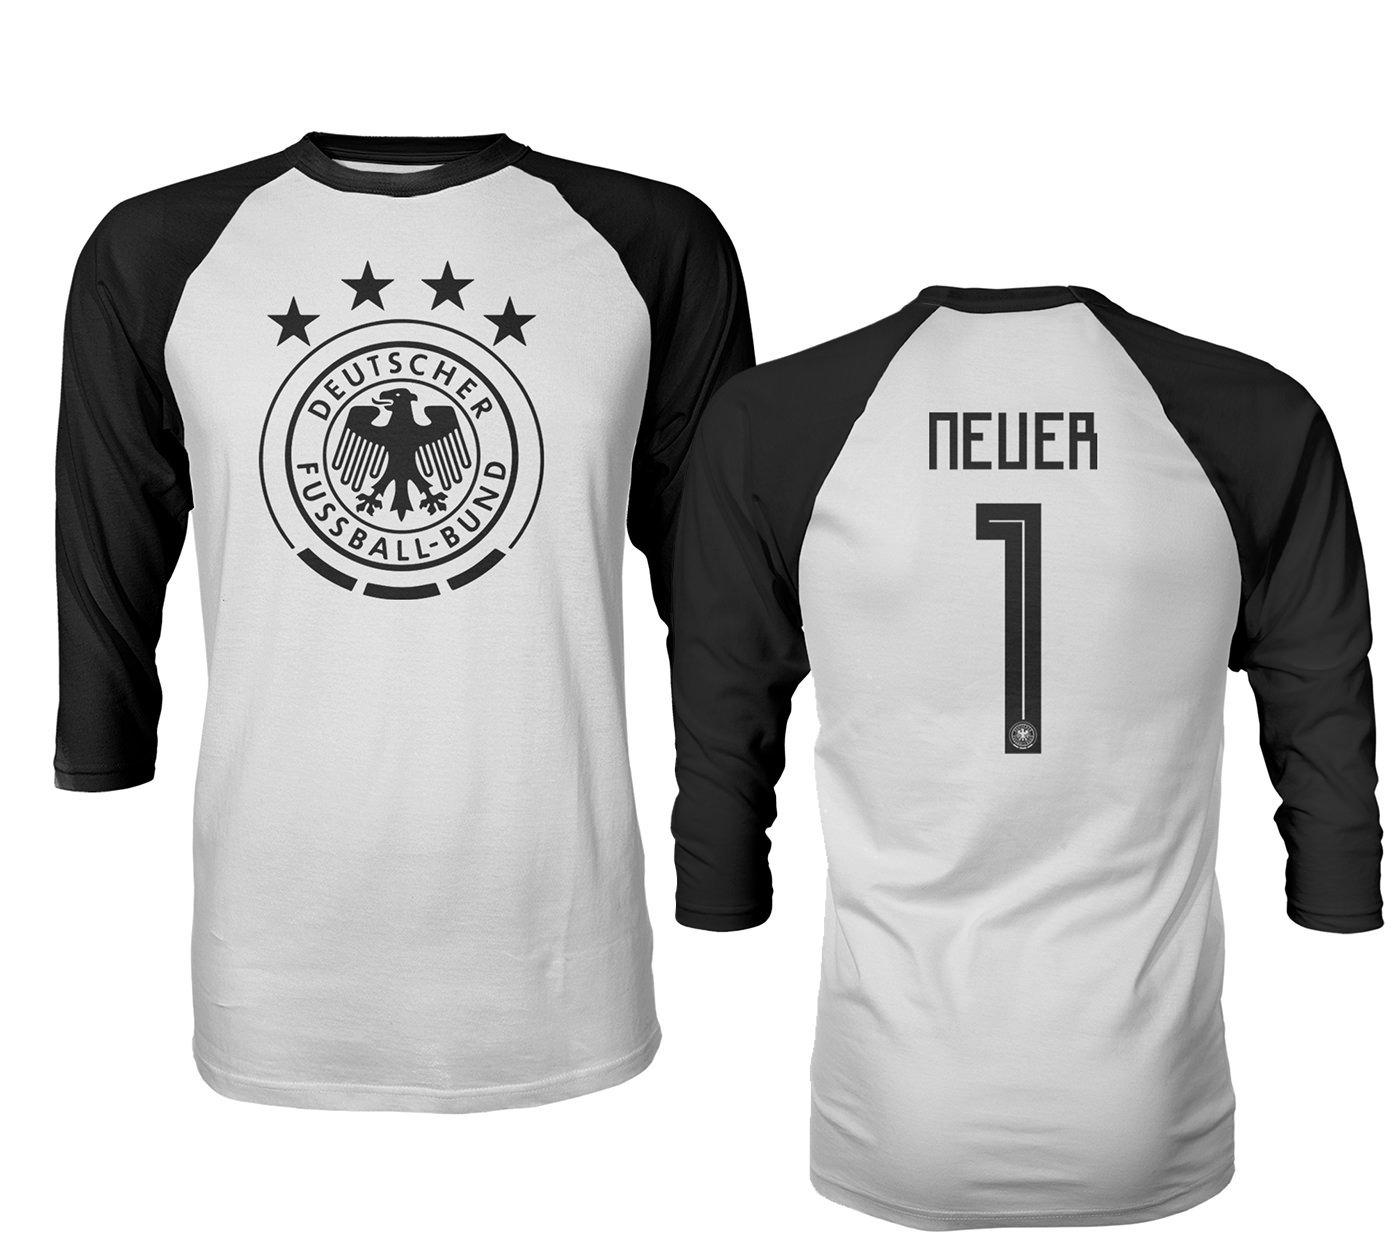 sale retailer f8cb8 a0f89 Tcamp Germany 2018 National Soccer #1 Manuel NEUER World Championship Men's  Quarter Sleeve Raglan T-Shirt